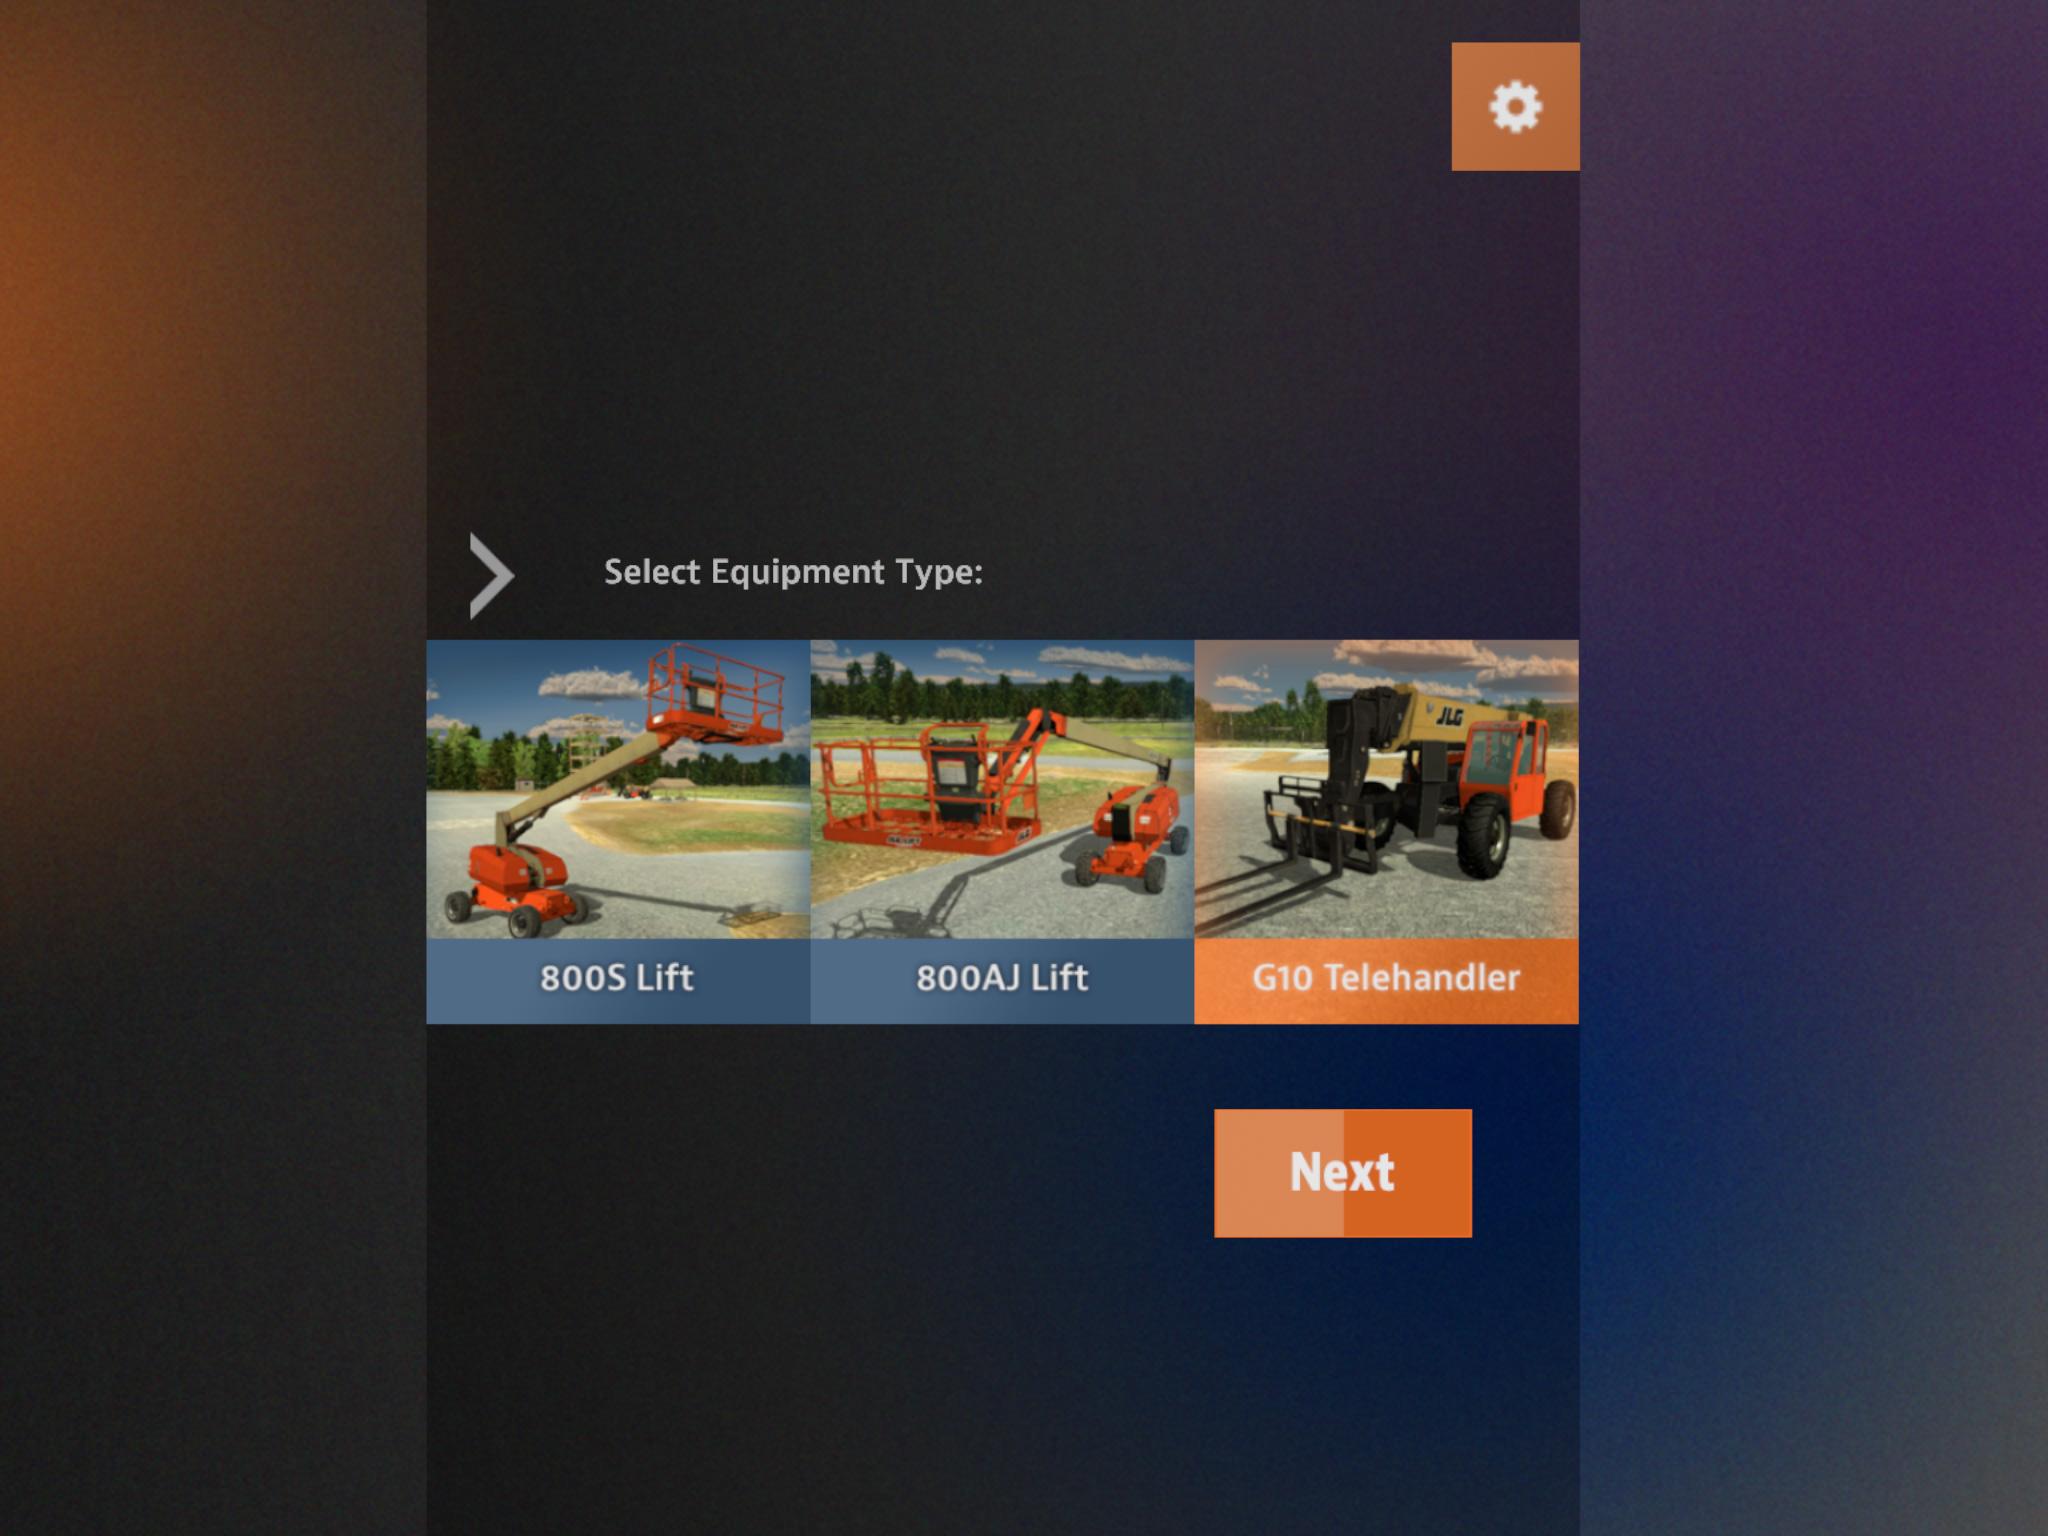 JLG Industries Tablet Based Training Simulator